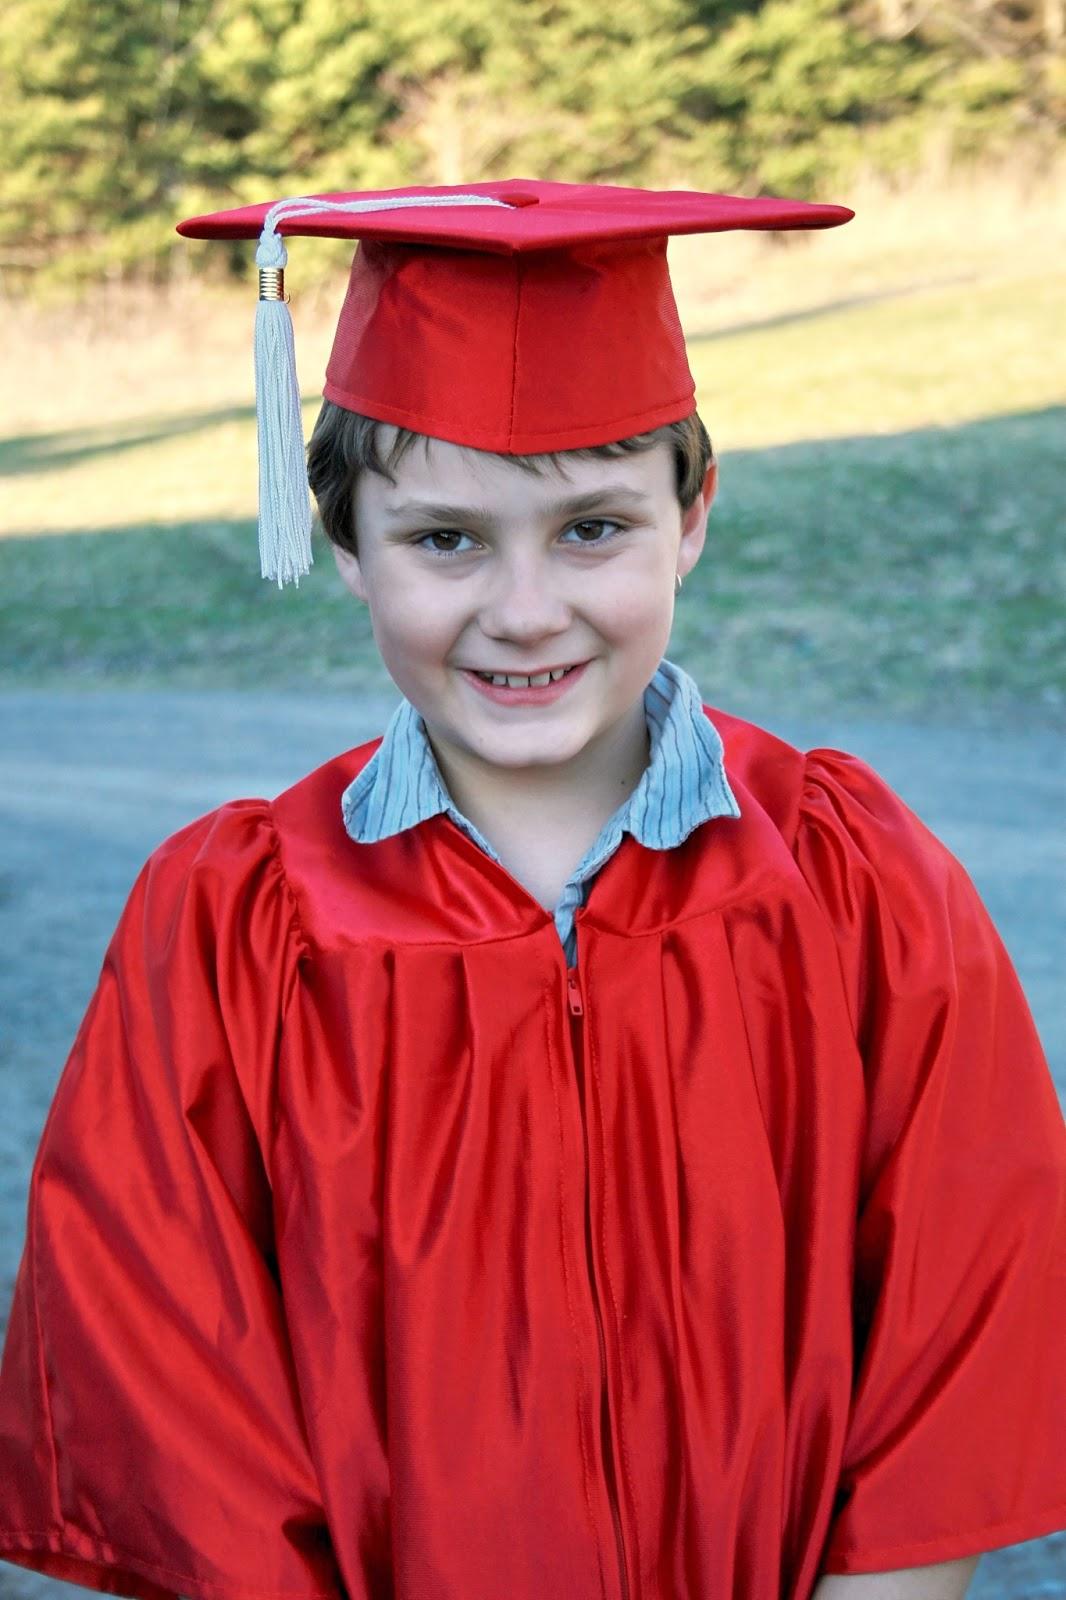 Cap and gown for kindergarten - Gradshop Graduation Cap And Gown Child